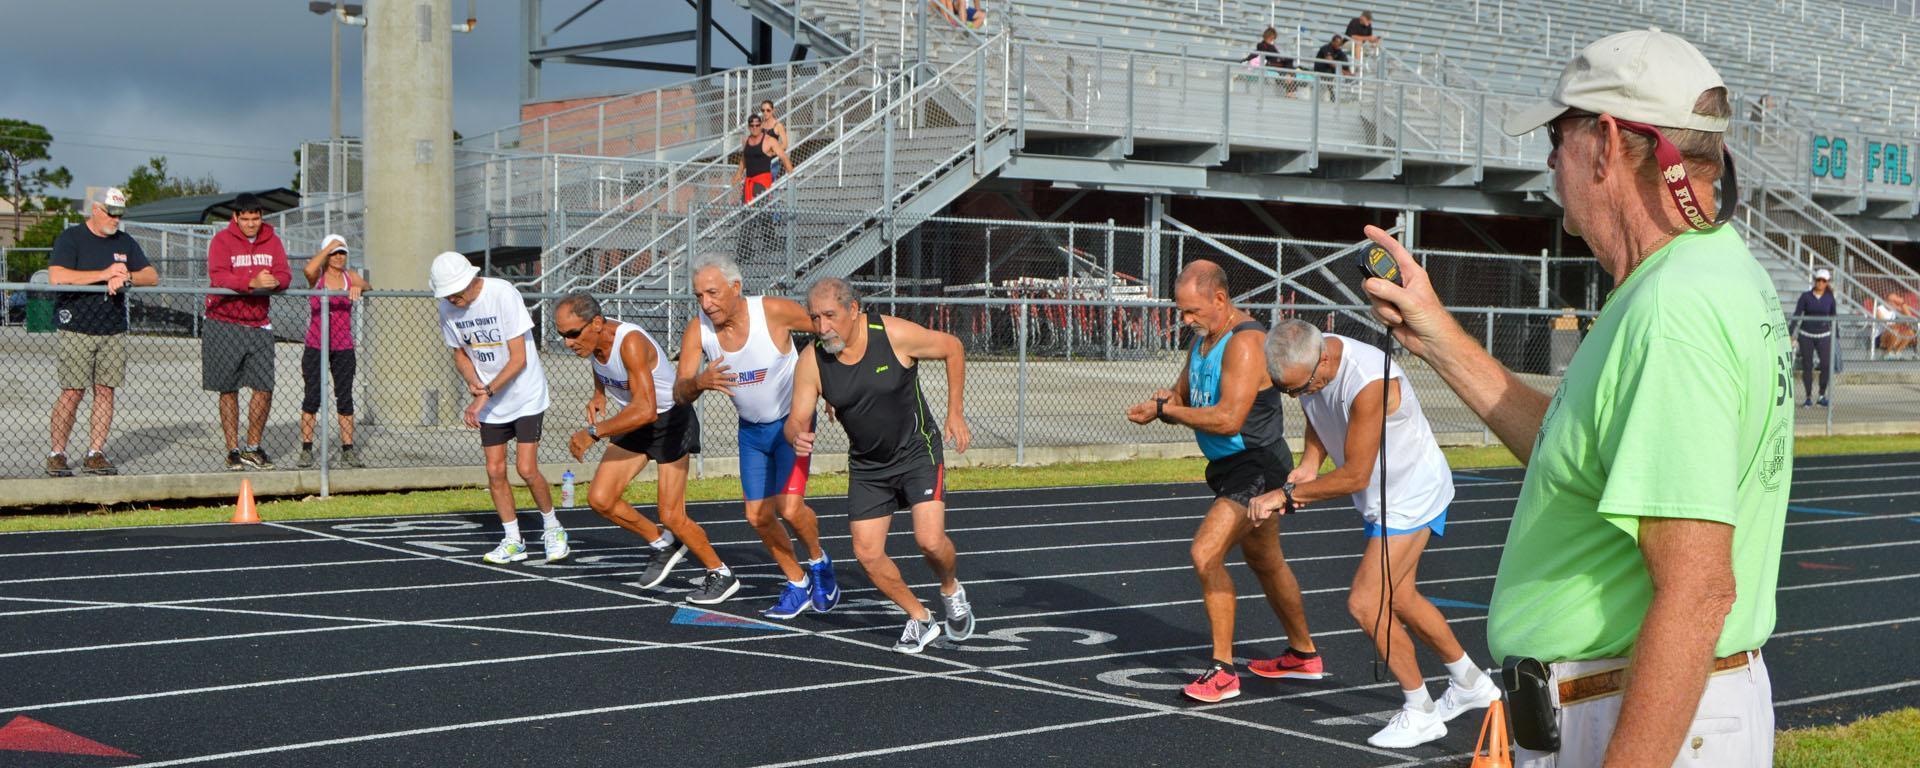 Martin County Senior Games track participants.